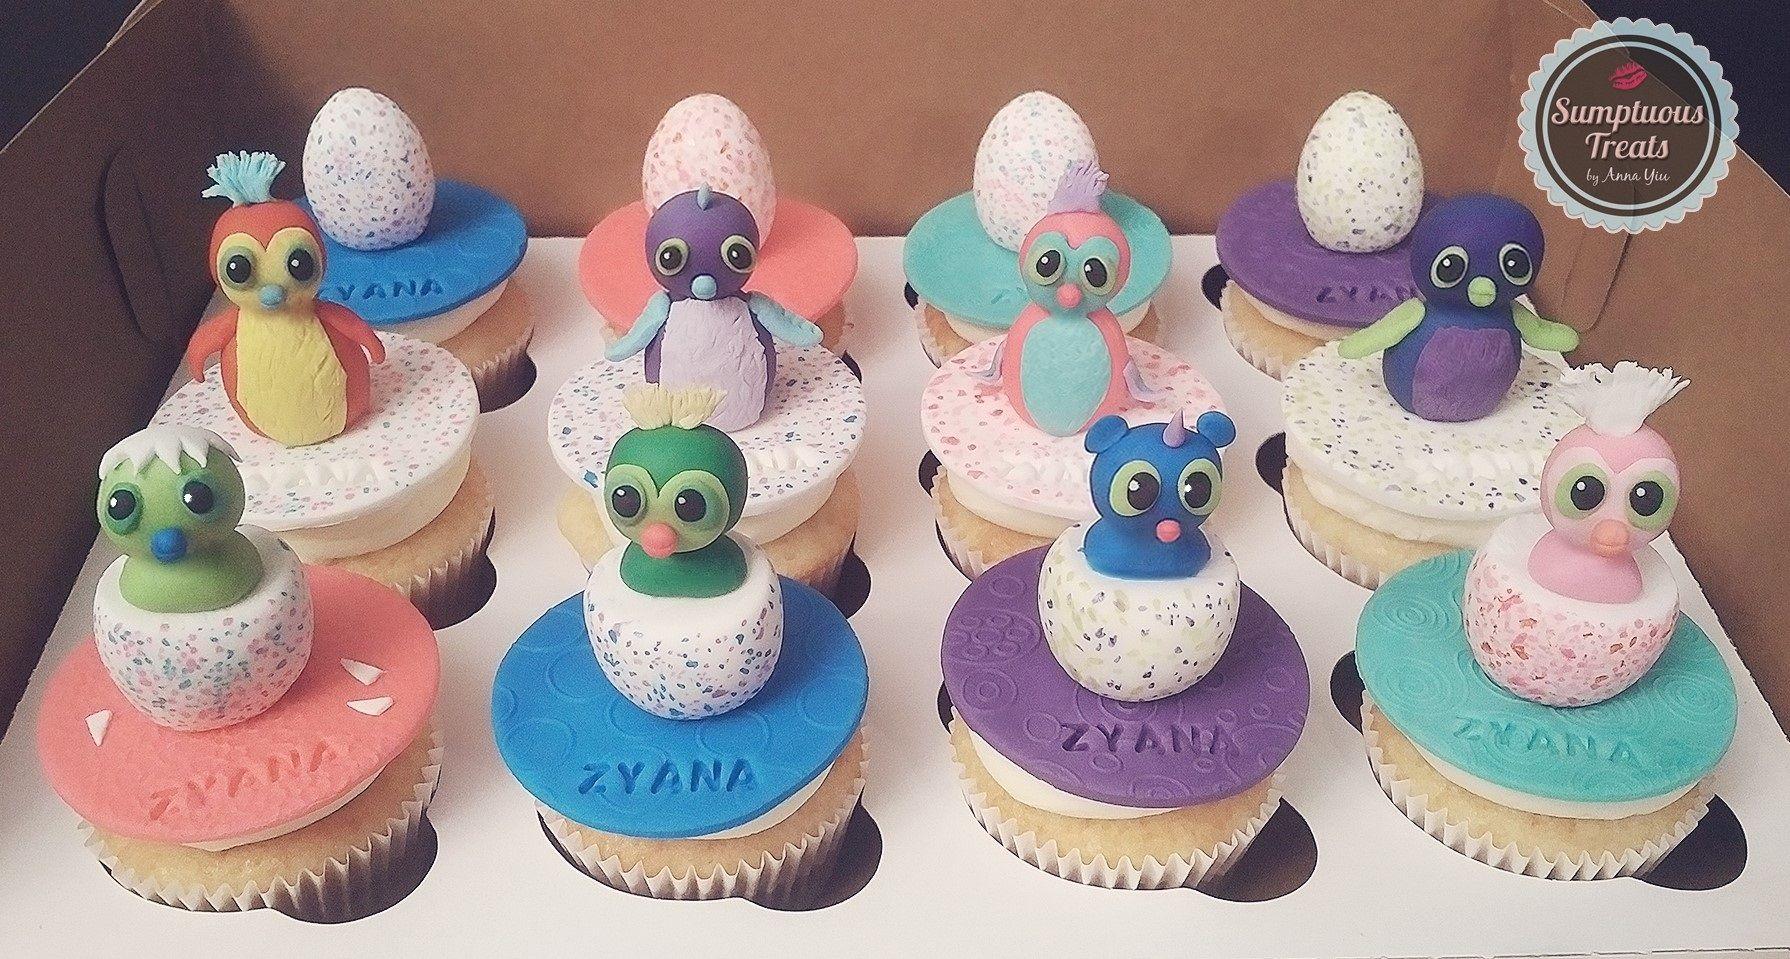 Hatchimals Cupcakes Custom Made To Order Cakes Cookies Edible Art Sumptuoustreats